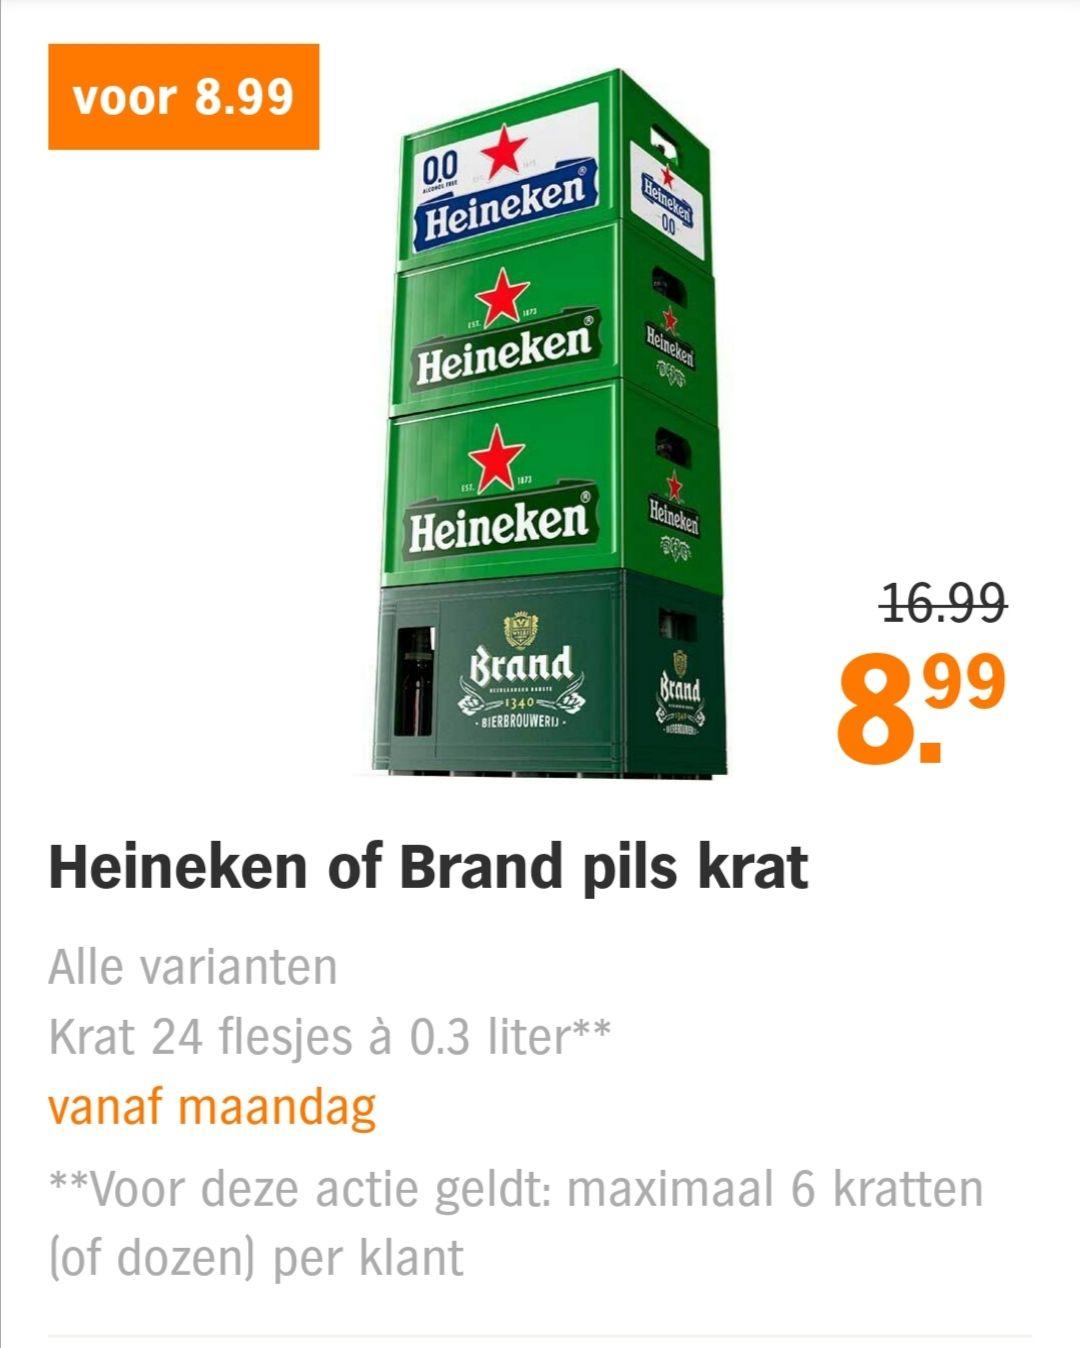 Krat Heineken of Brand @AH